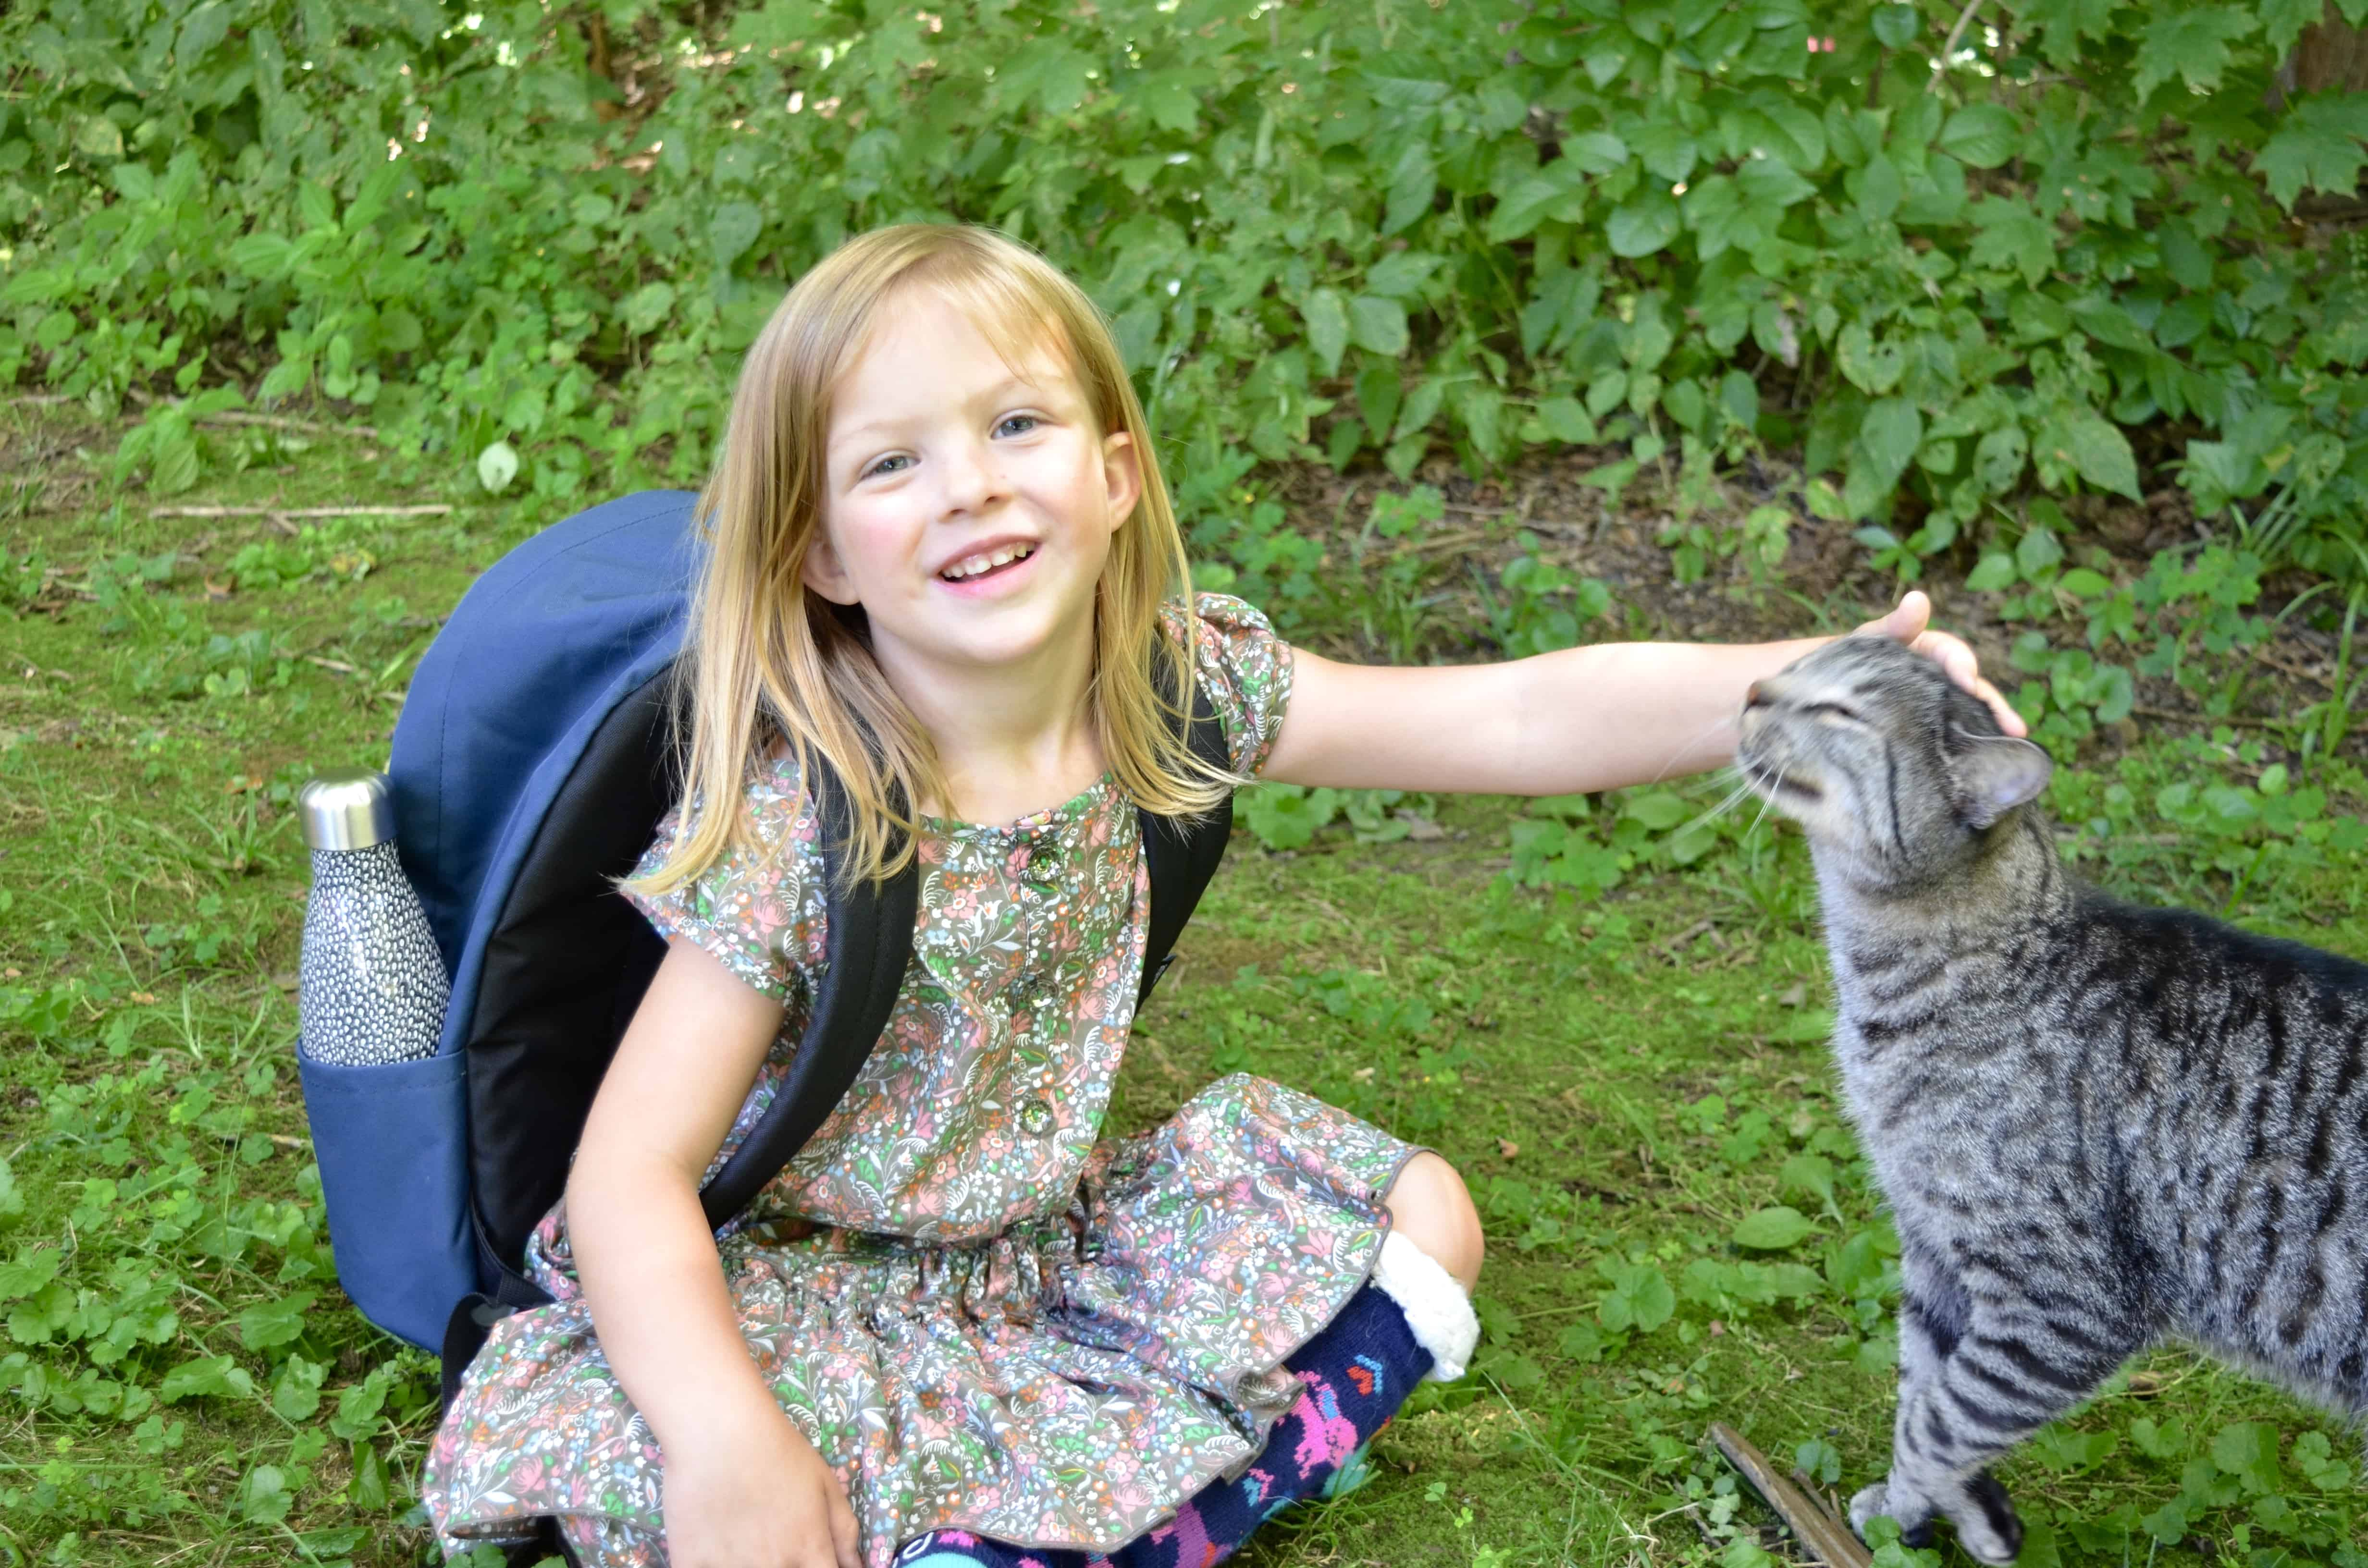 preschool girl wearing backpack petting cat